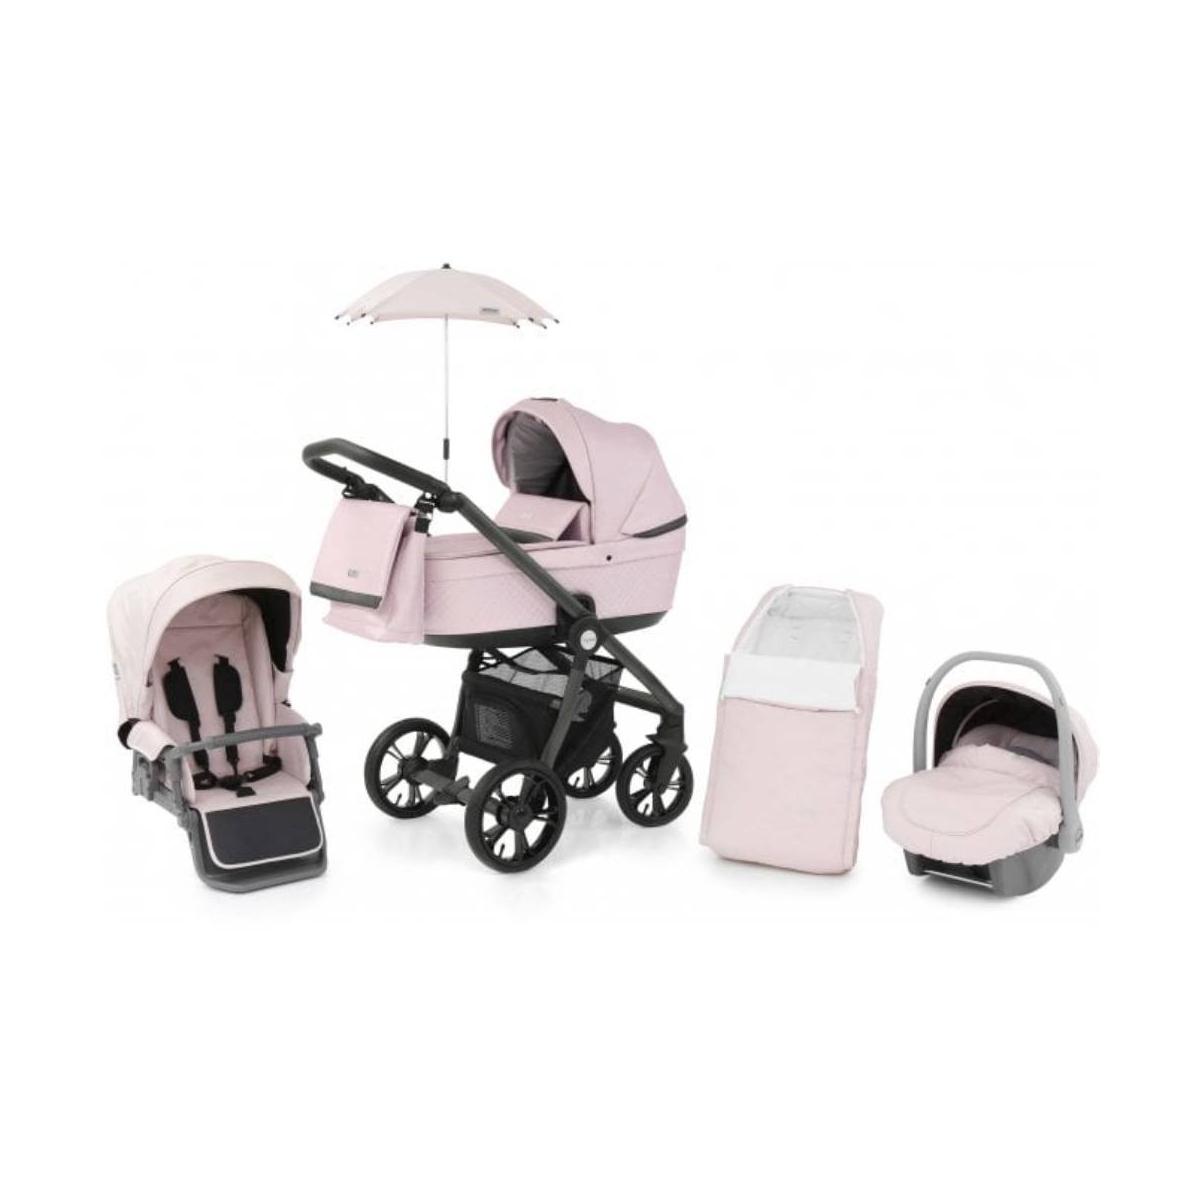 BabyStyle Prestige 3 3in1 Travel System Grey Frame/Black-Ballerina